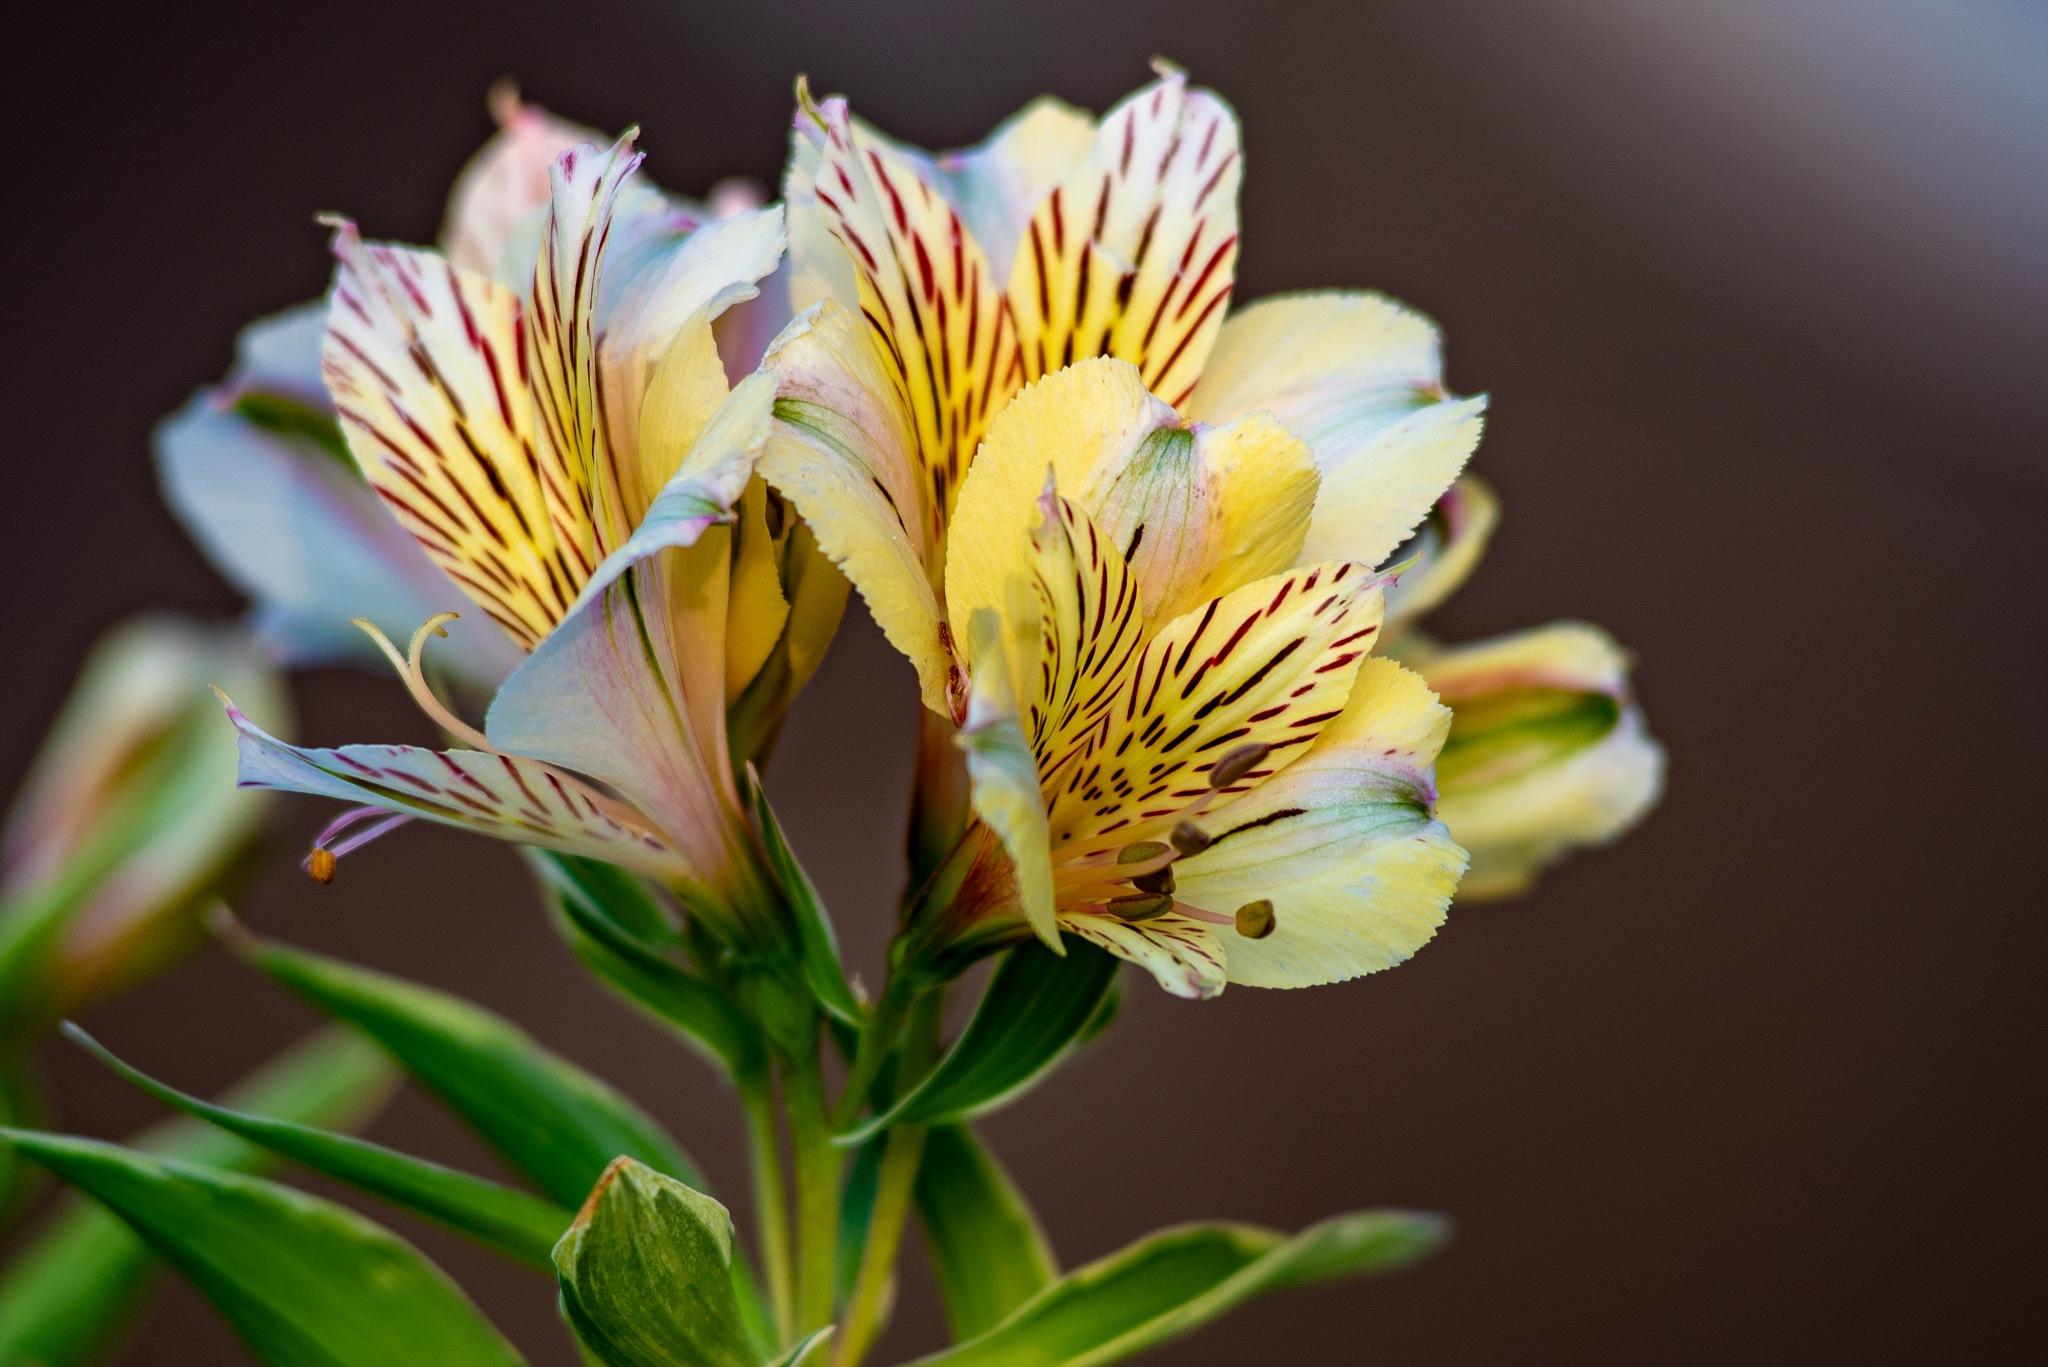 Peruvian lilies petals by Sándor Dombora